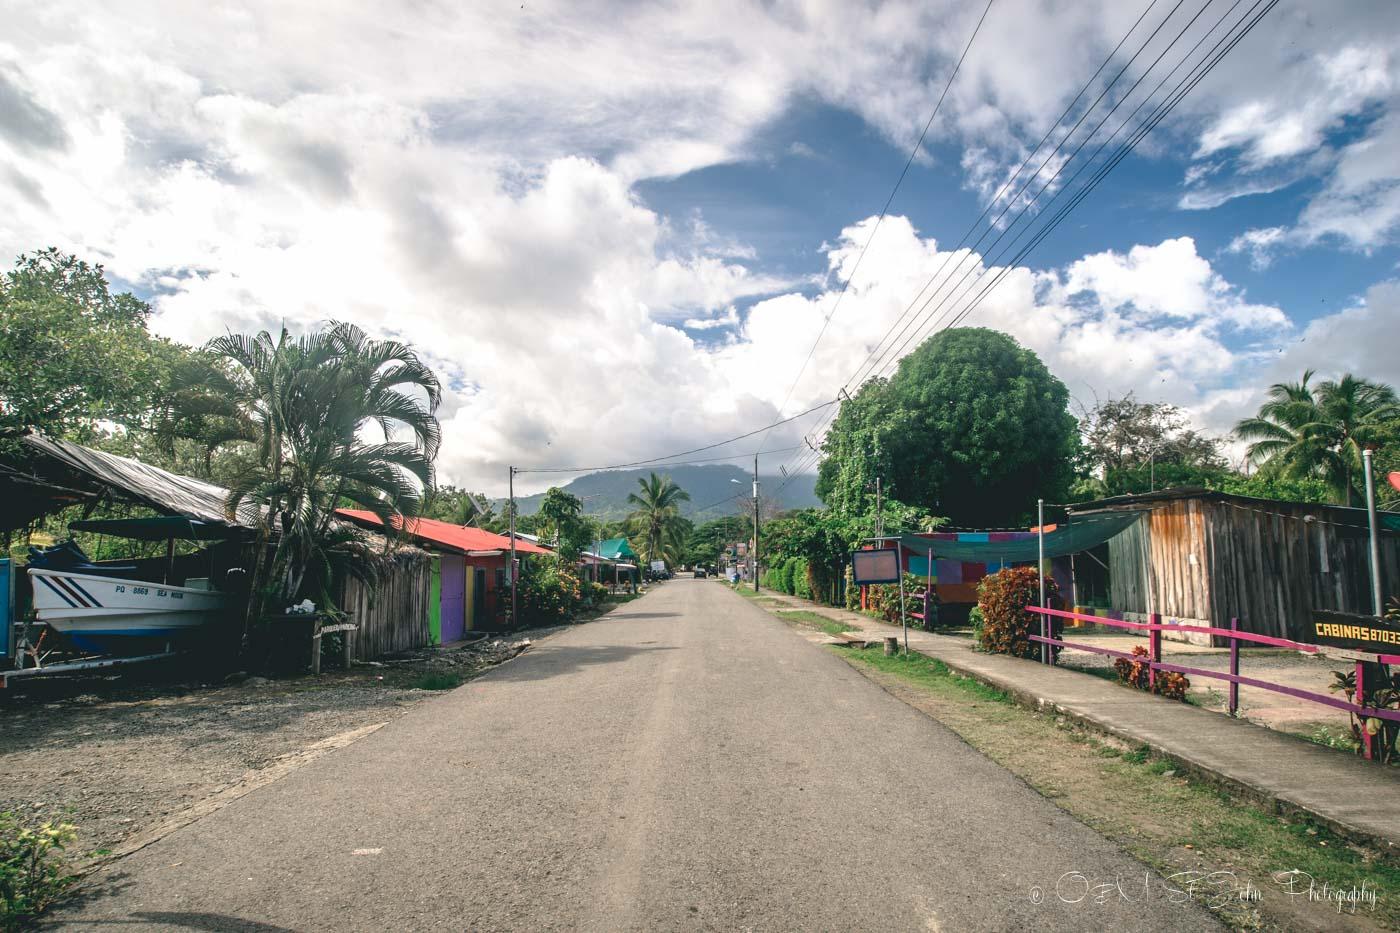 Manuel Antonio National Park: Costa Rica Dominical